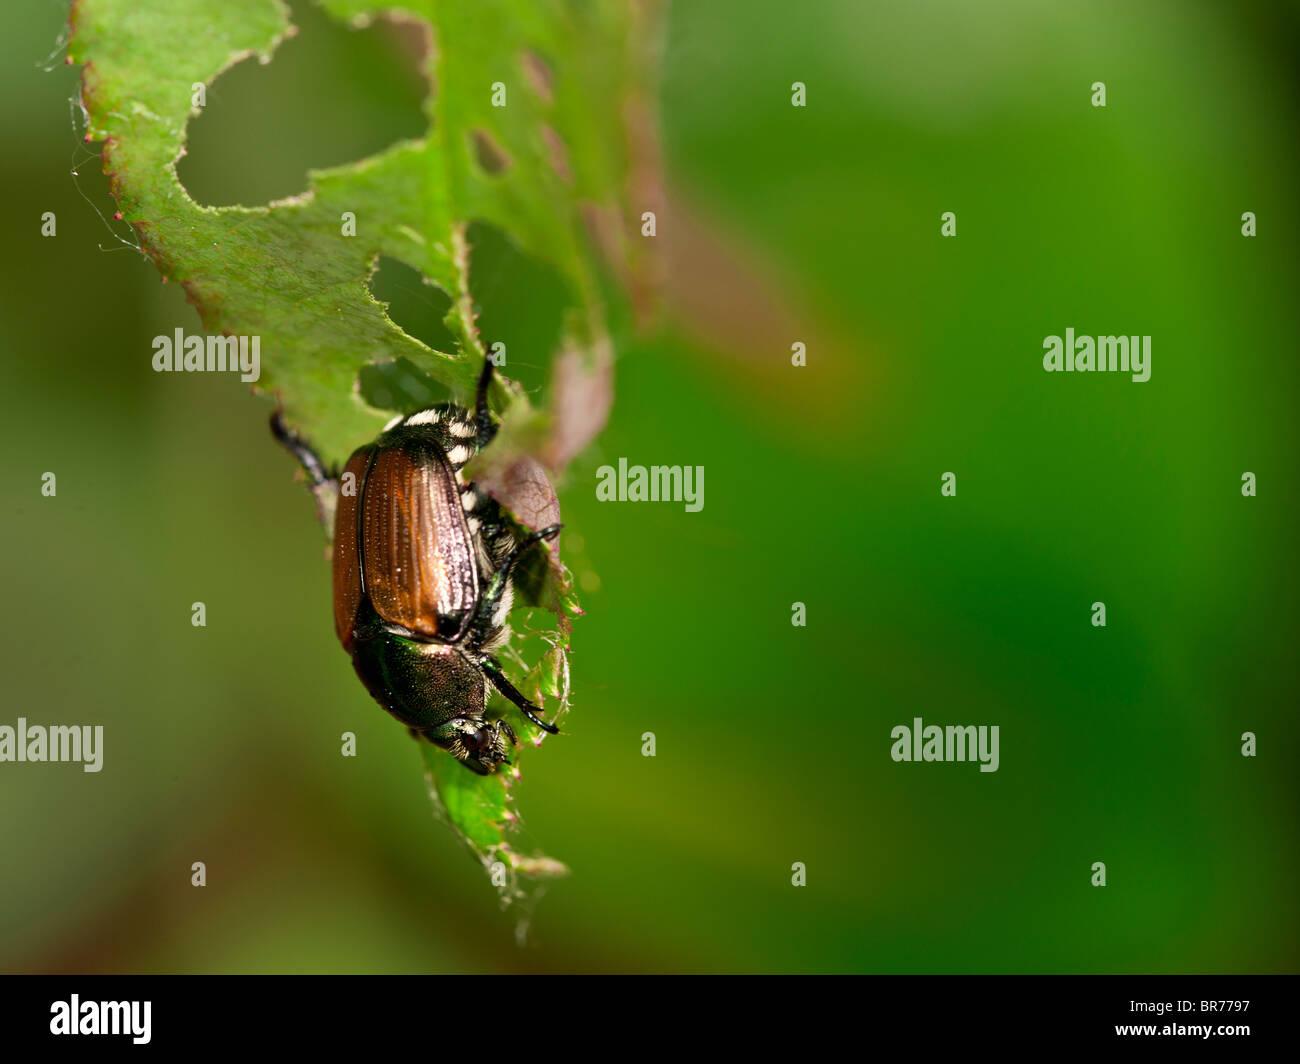 Invasive Japanese Beetle on a Rose leaf. - Stock Image